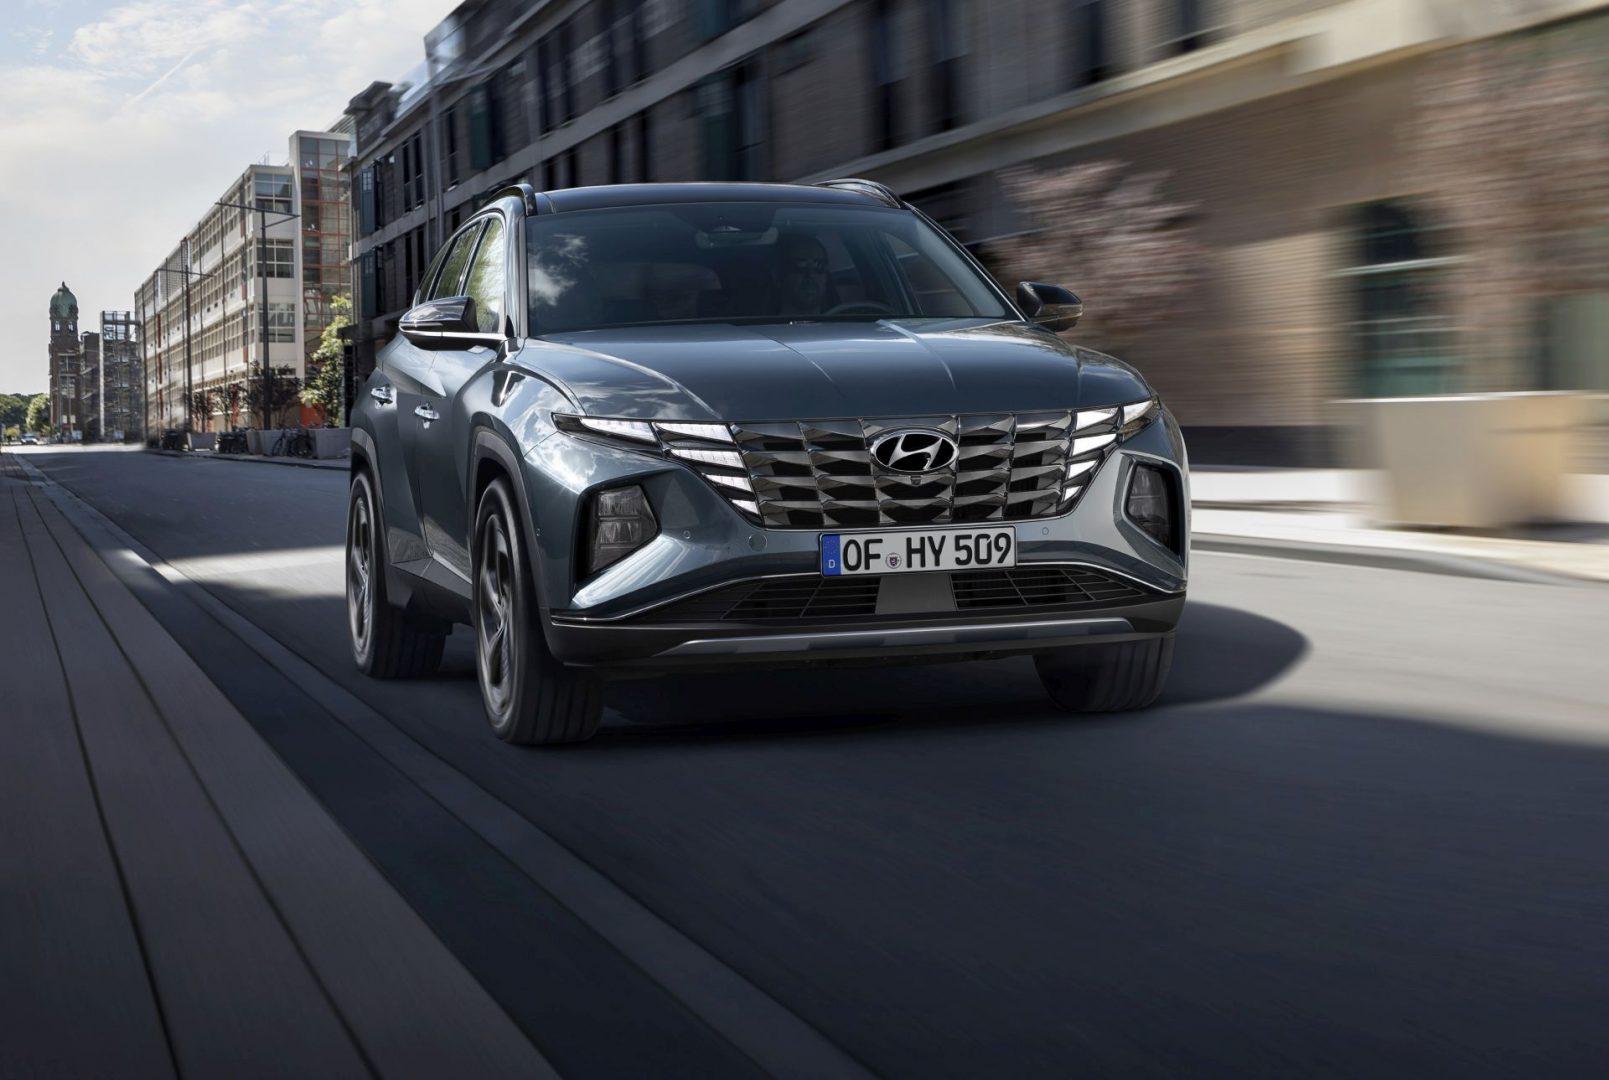 Novi Hyundai Tucson donosi jedinstveni dizajn i hibridne pogone